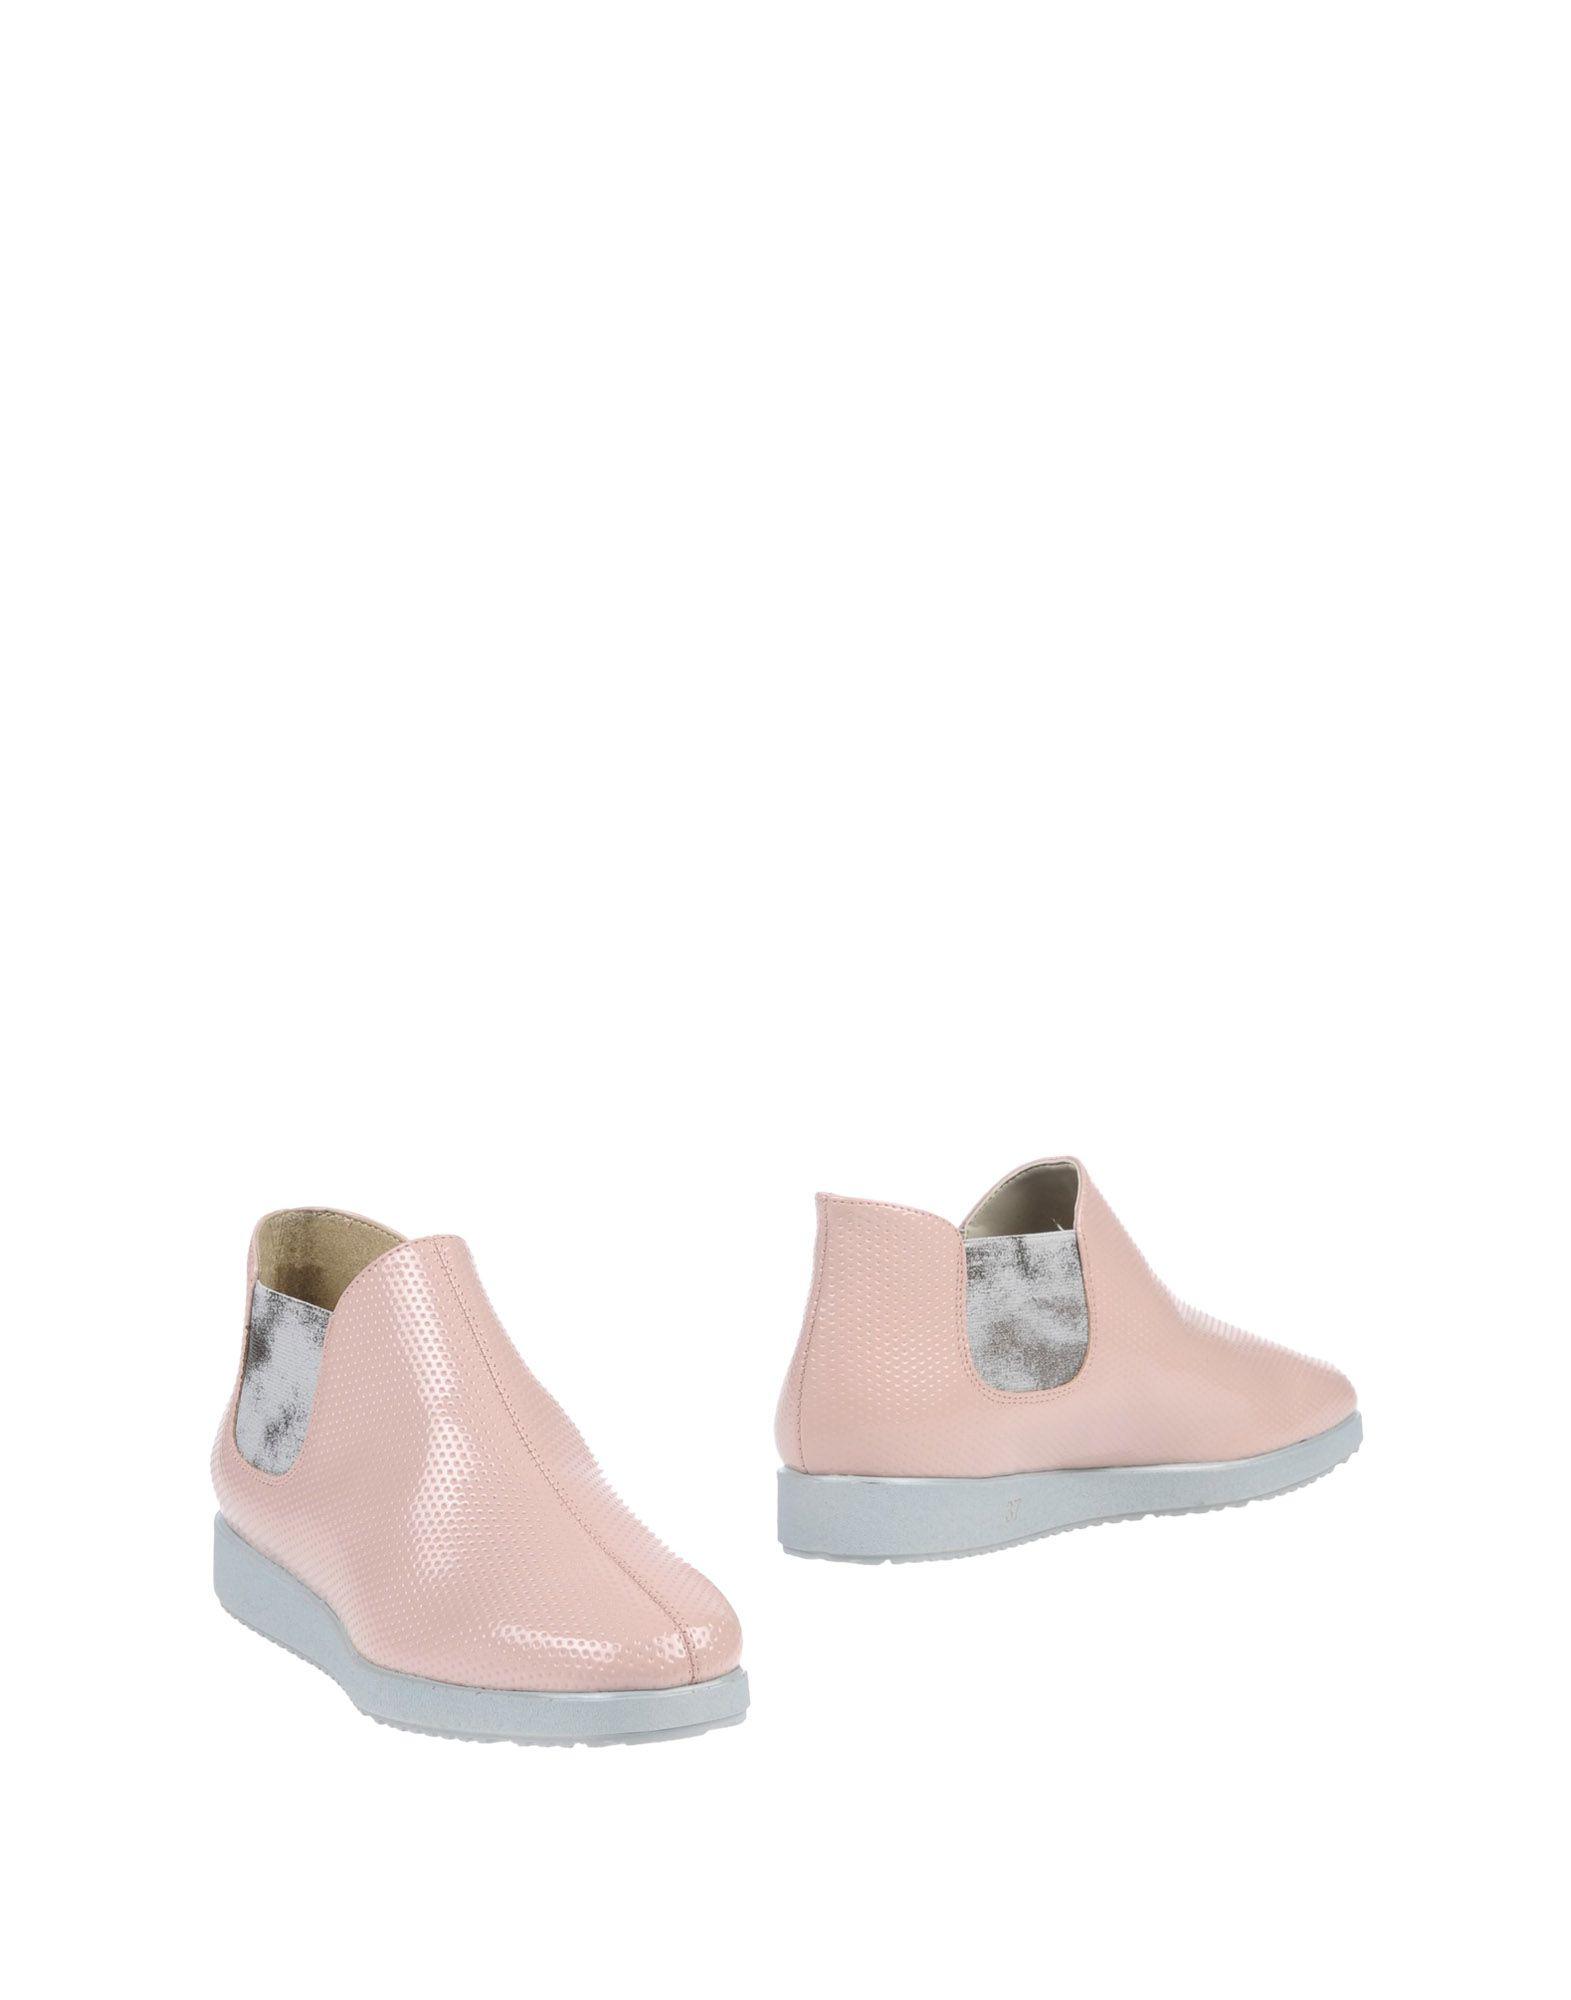 Nr Rapisardi Chelsea Boots Schuhe Damen  11418270QH Neue Schuhe Boots 0c14e6